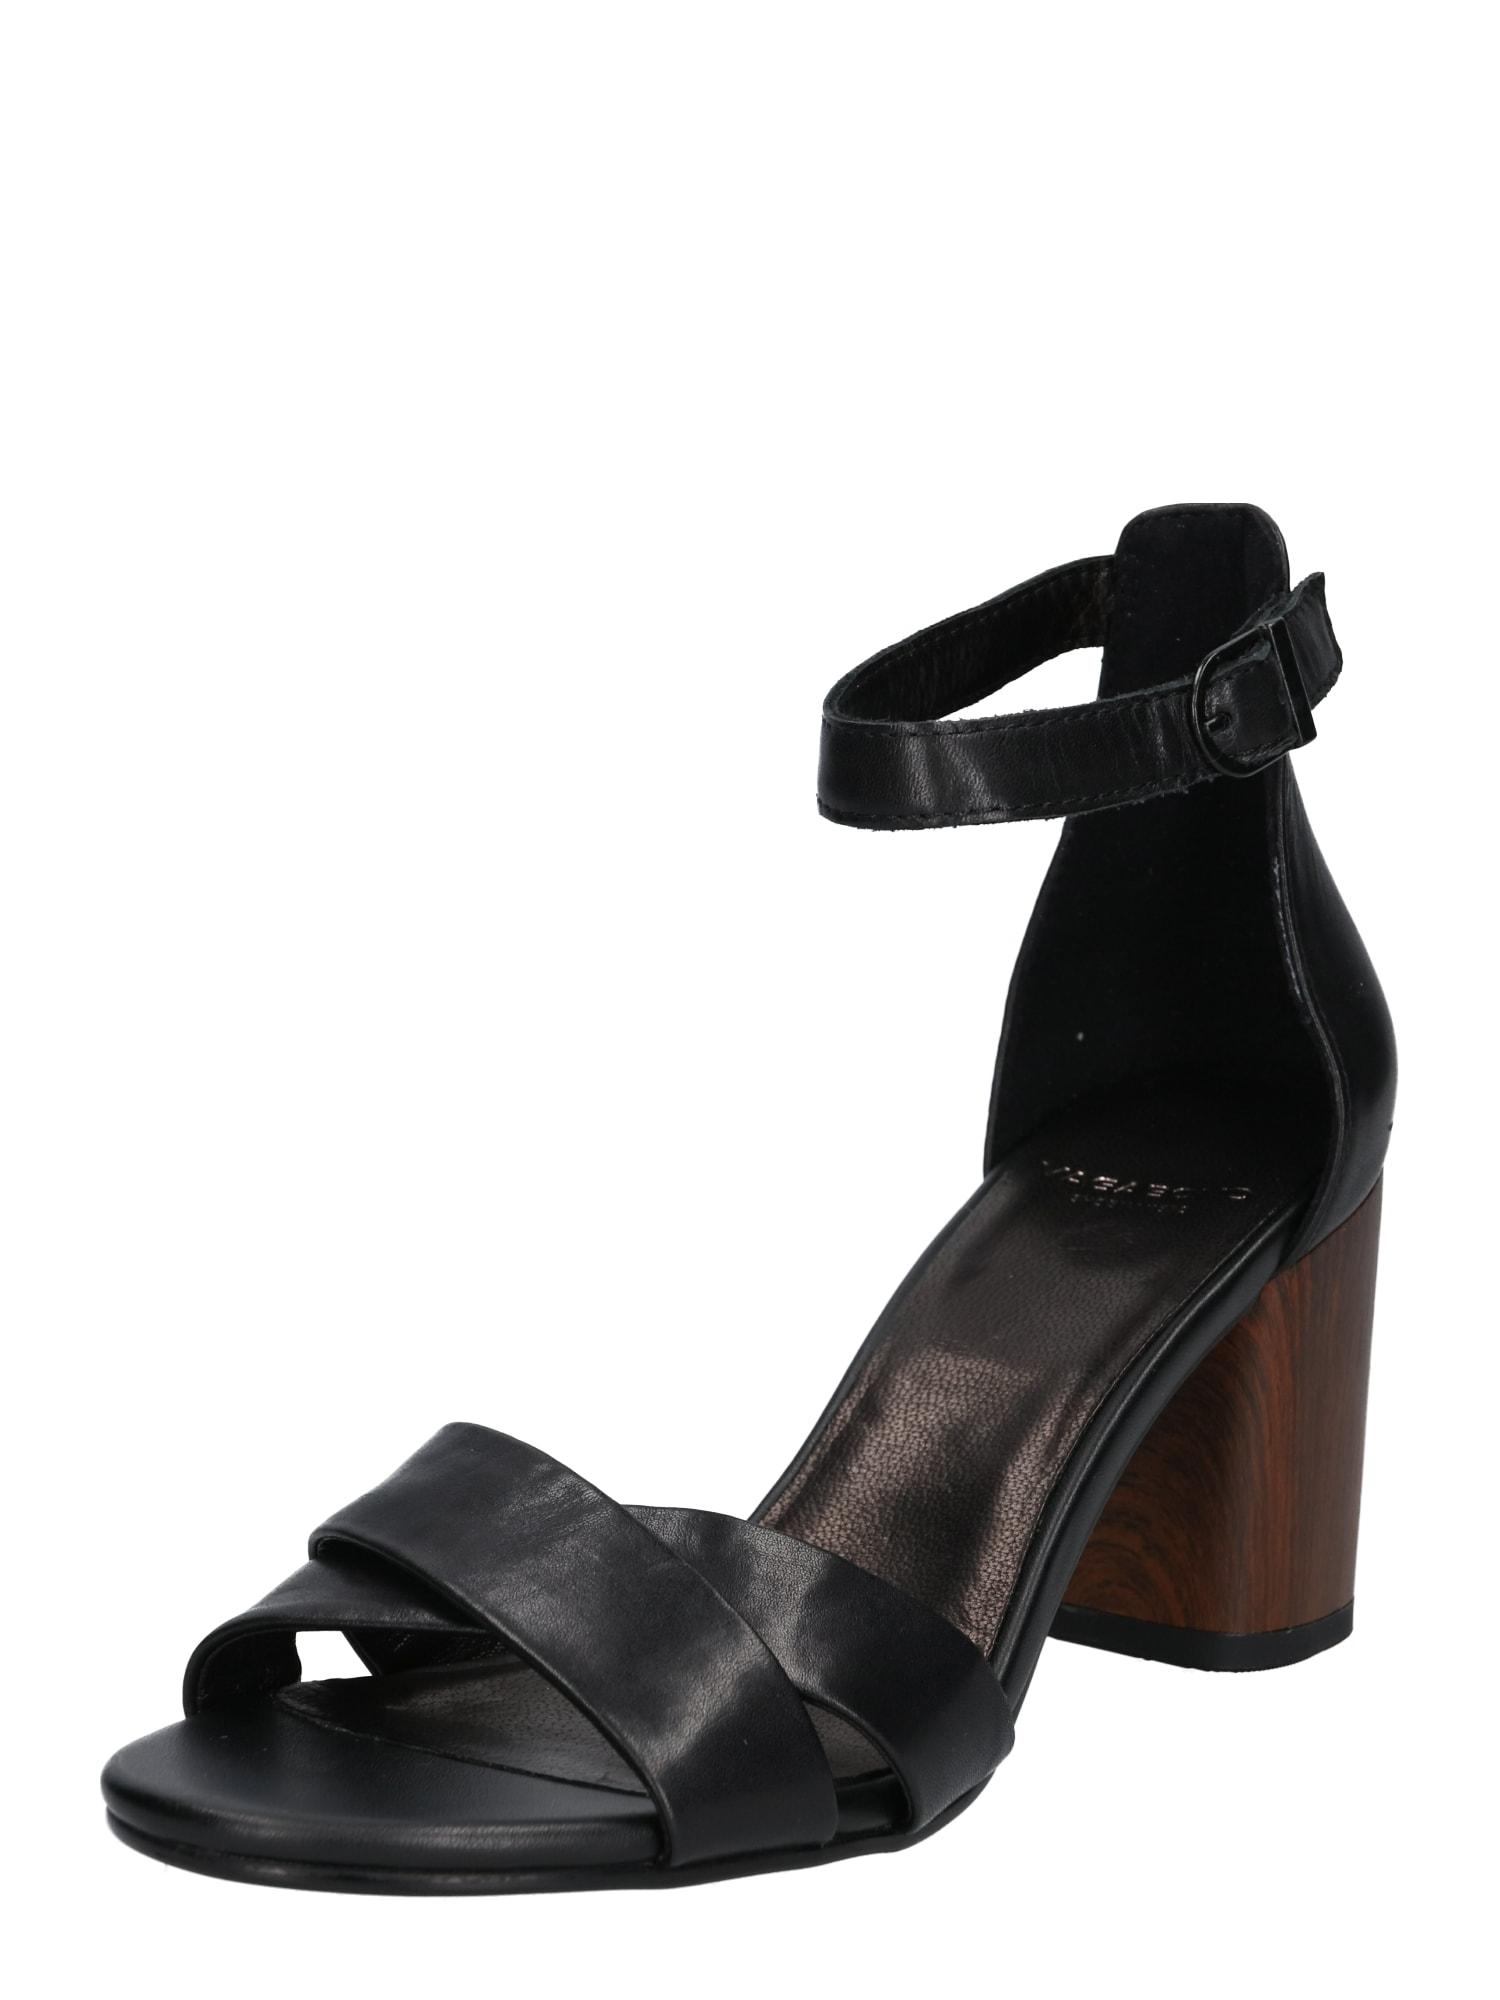 Páskové sandály Carol černá VAGABOND SHOEMAKERS